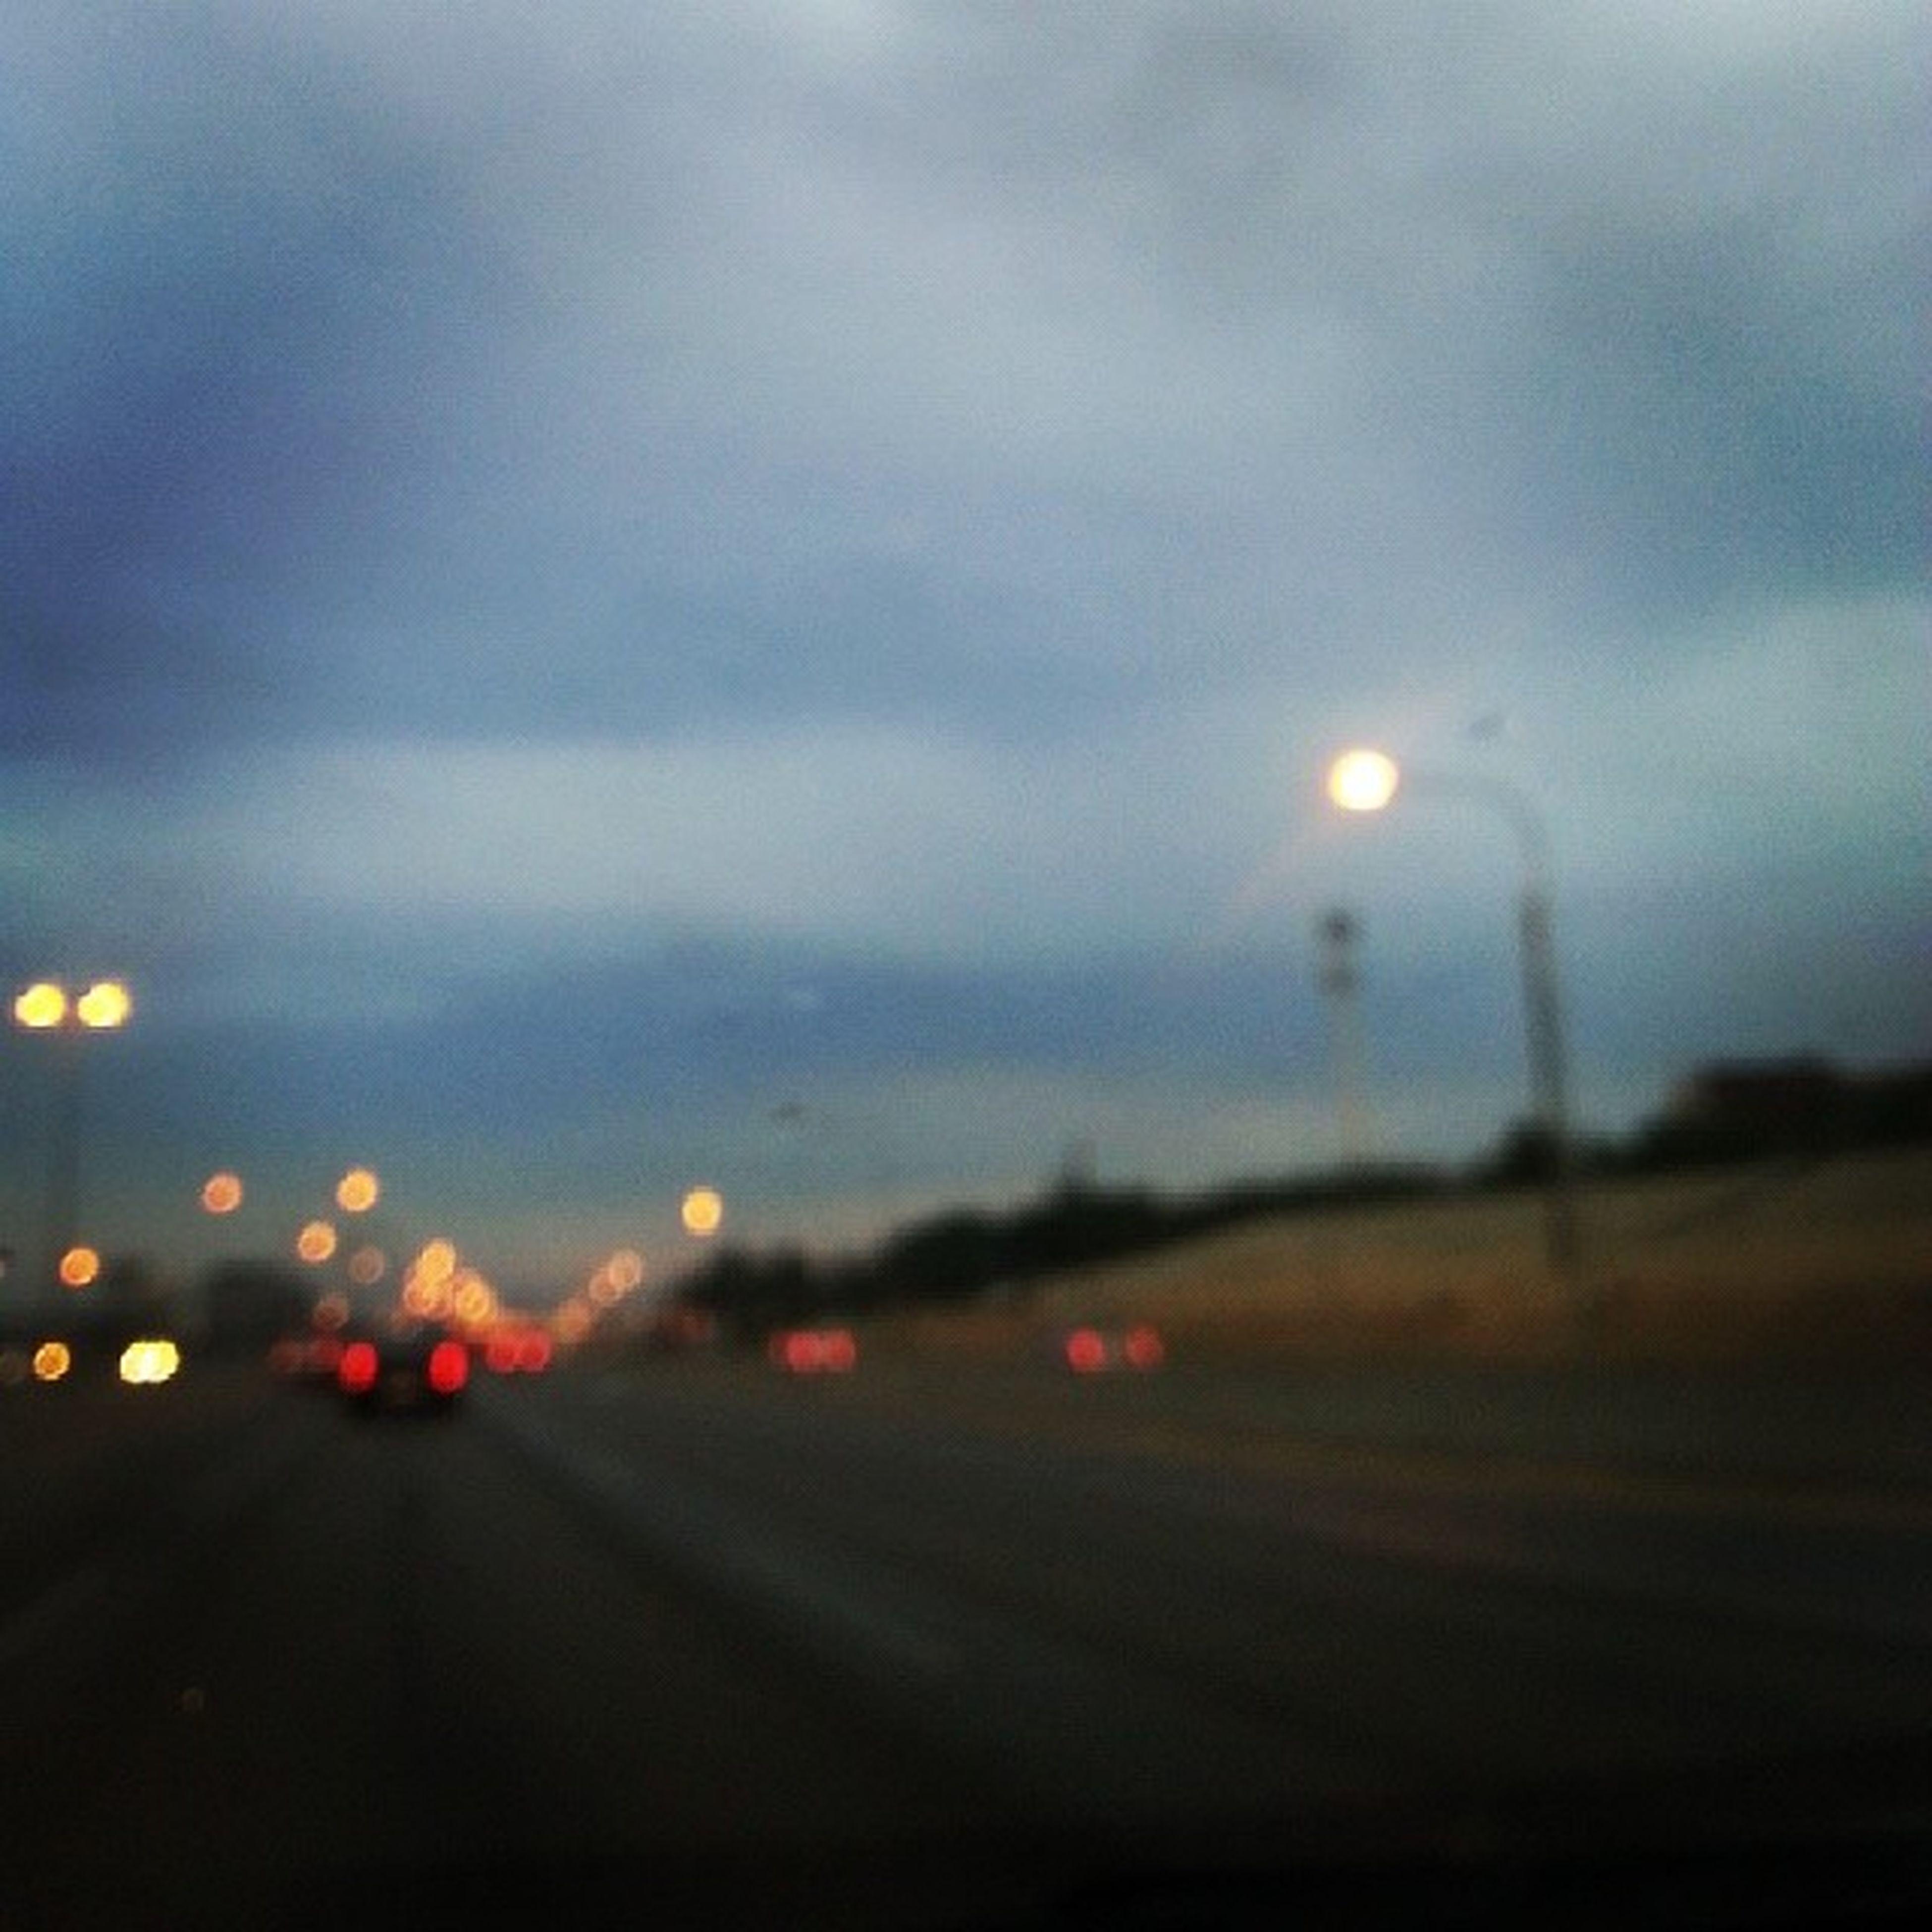 transportation, illuminated, road, sky, defocused, transparent, night, car, street, weather, street light, wet, glass - material, dusk, the way forward, land vehicle, mode of transport, rain, cloud - sky, road marking